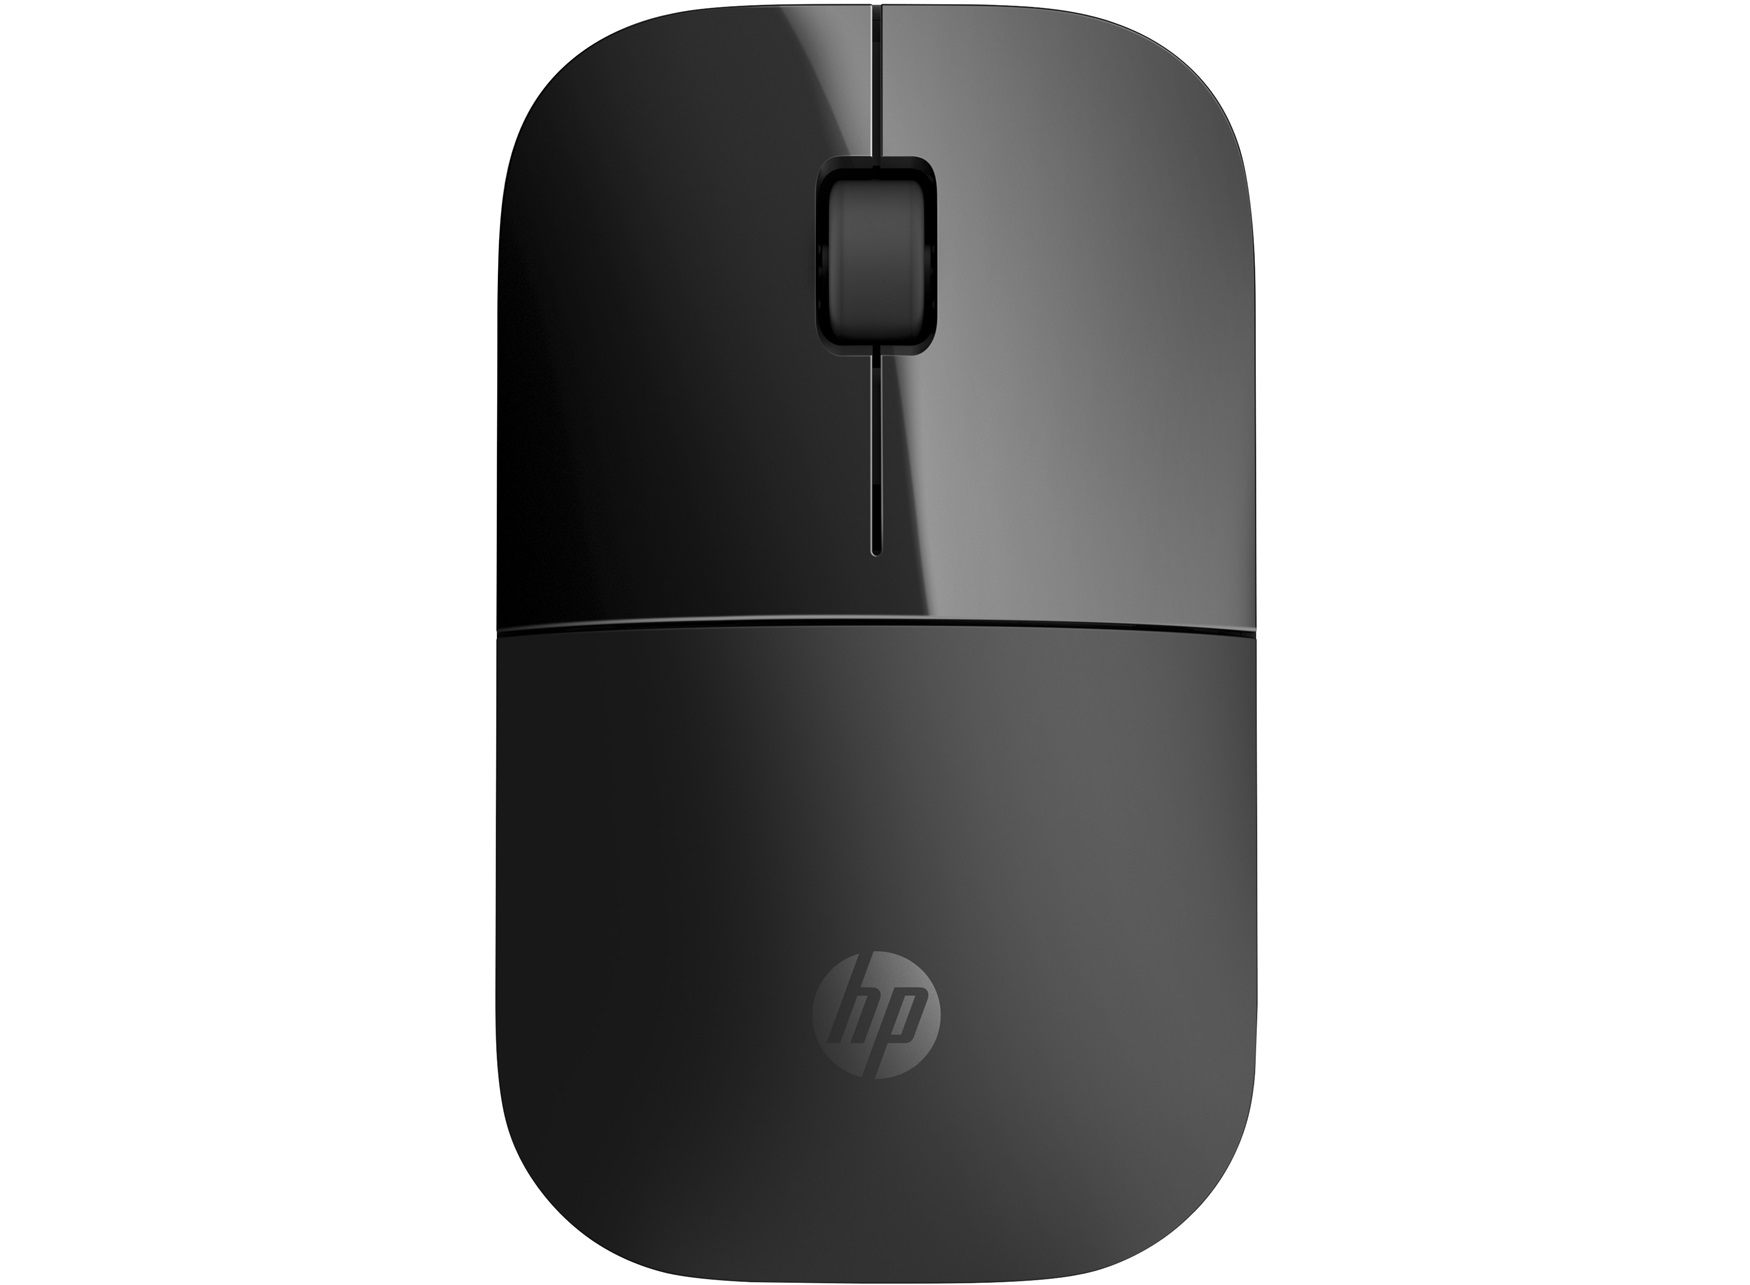 HP Z3700 Wireless Mouse - Black Onyx